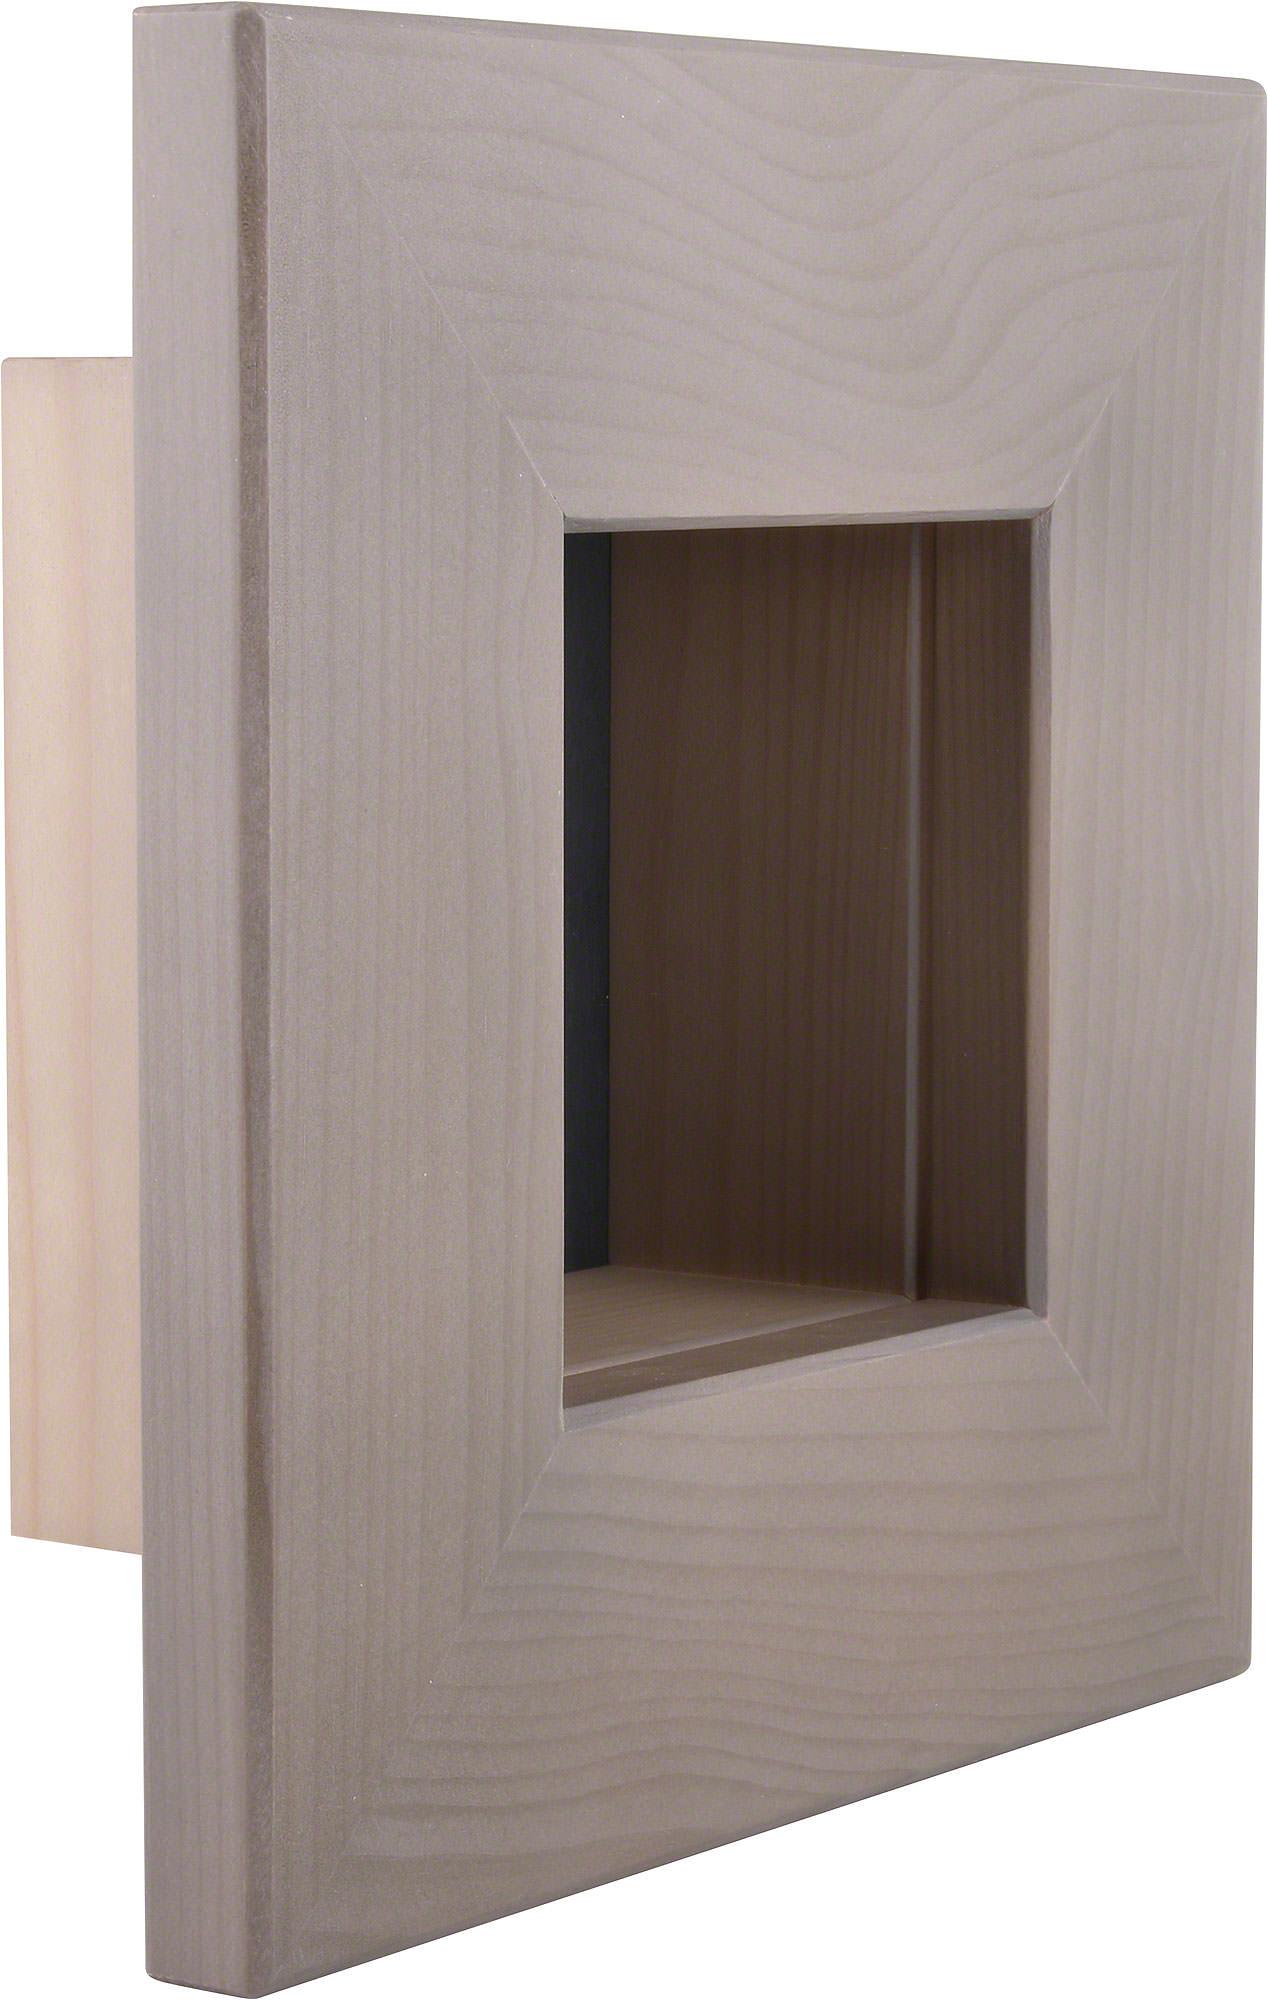 Wandrahmen grau (23×23×8 cm) von Björn Köhler Kunsthandwerk